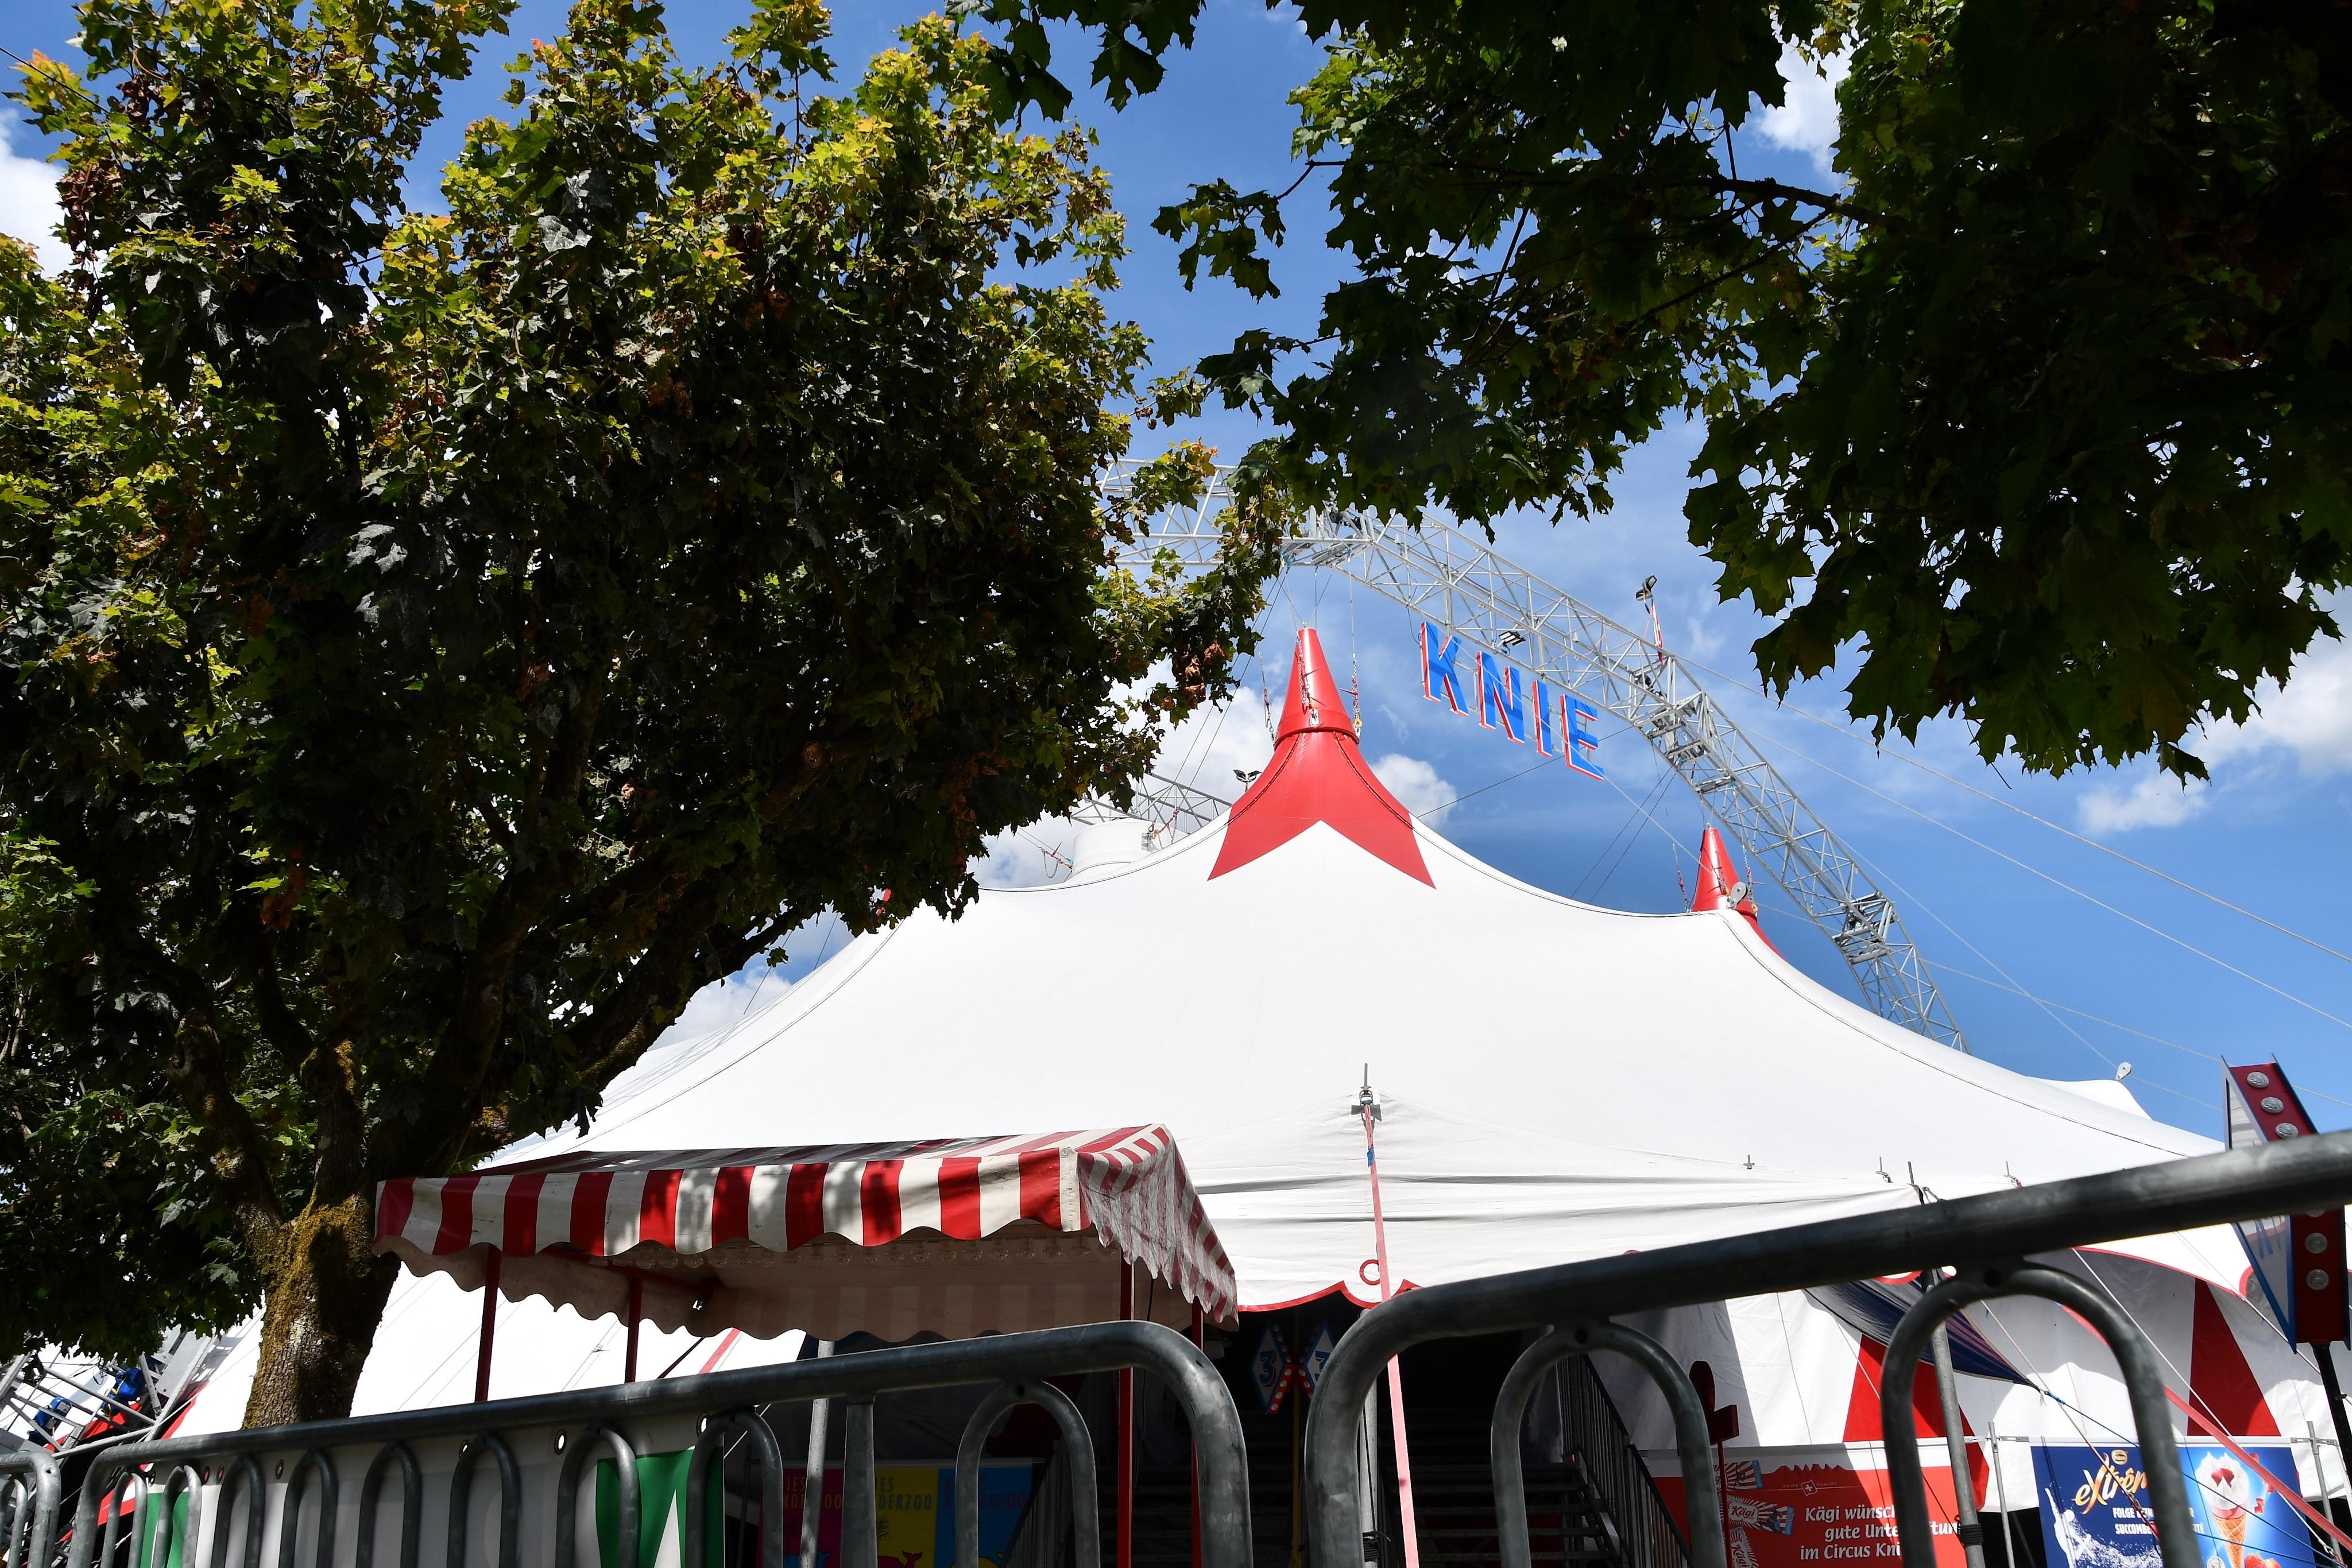 circus-knie-03.08.-6